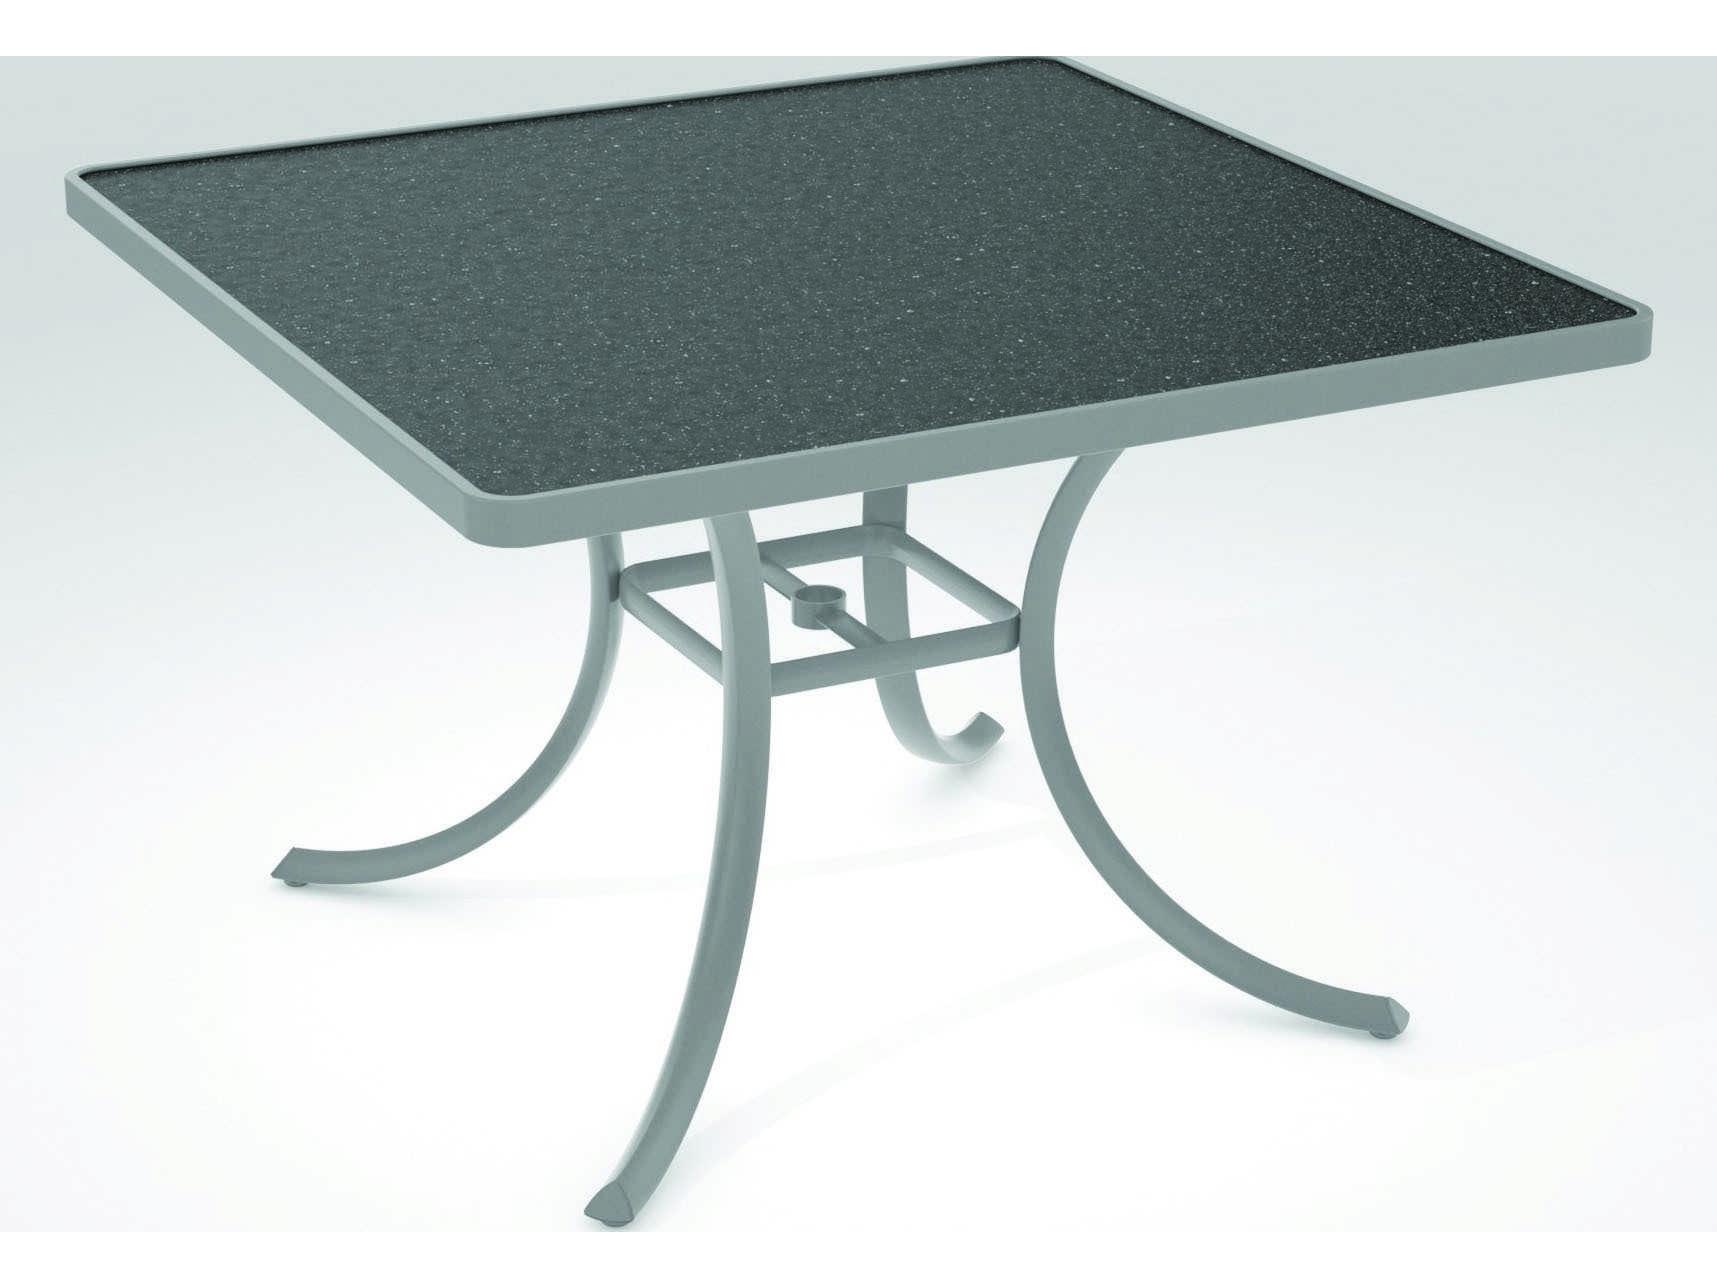 Tropitone Hpl Raduno Aluminum 42 Sqaure Dining Table Tp1877h